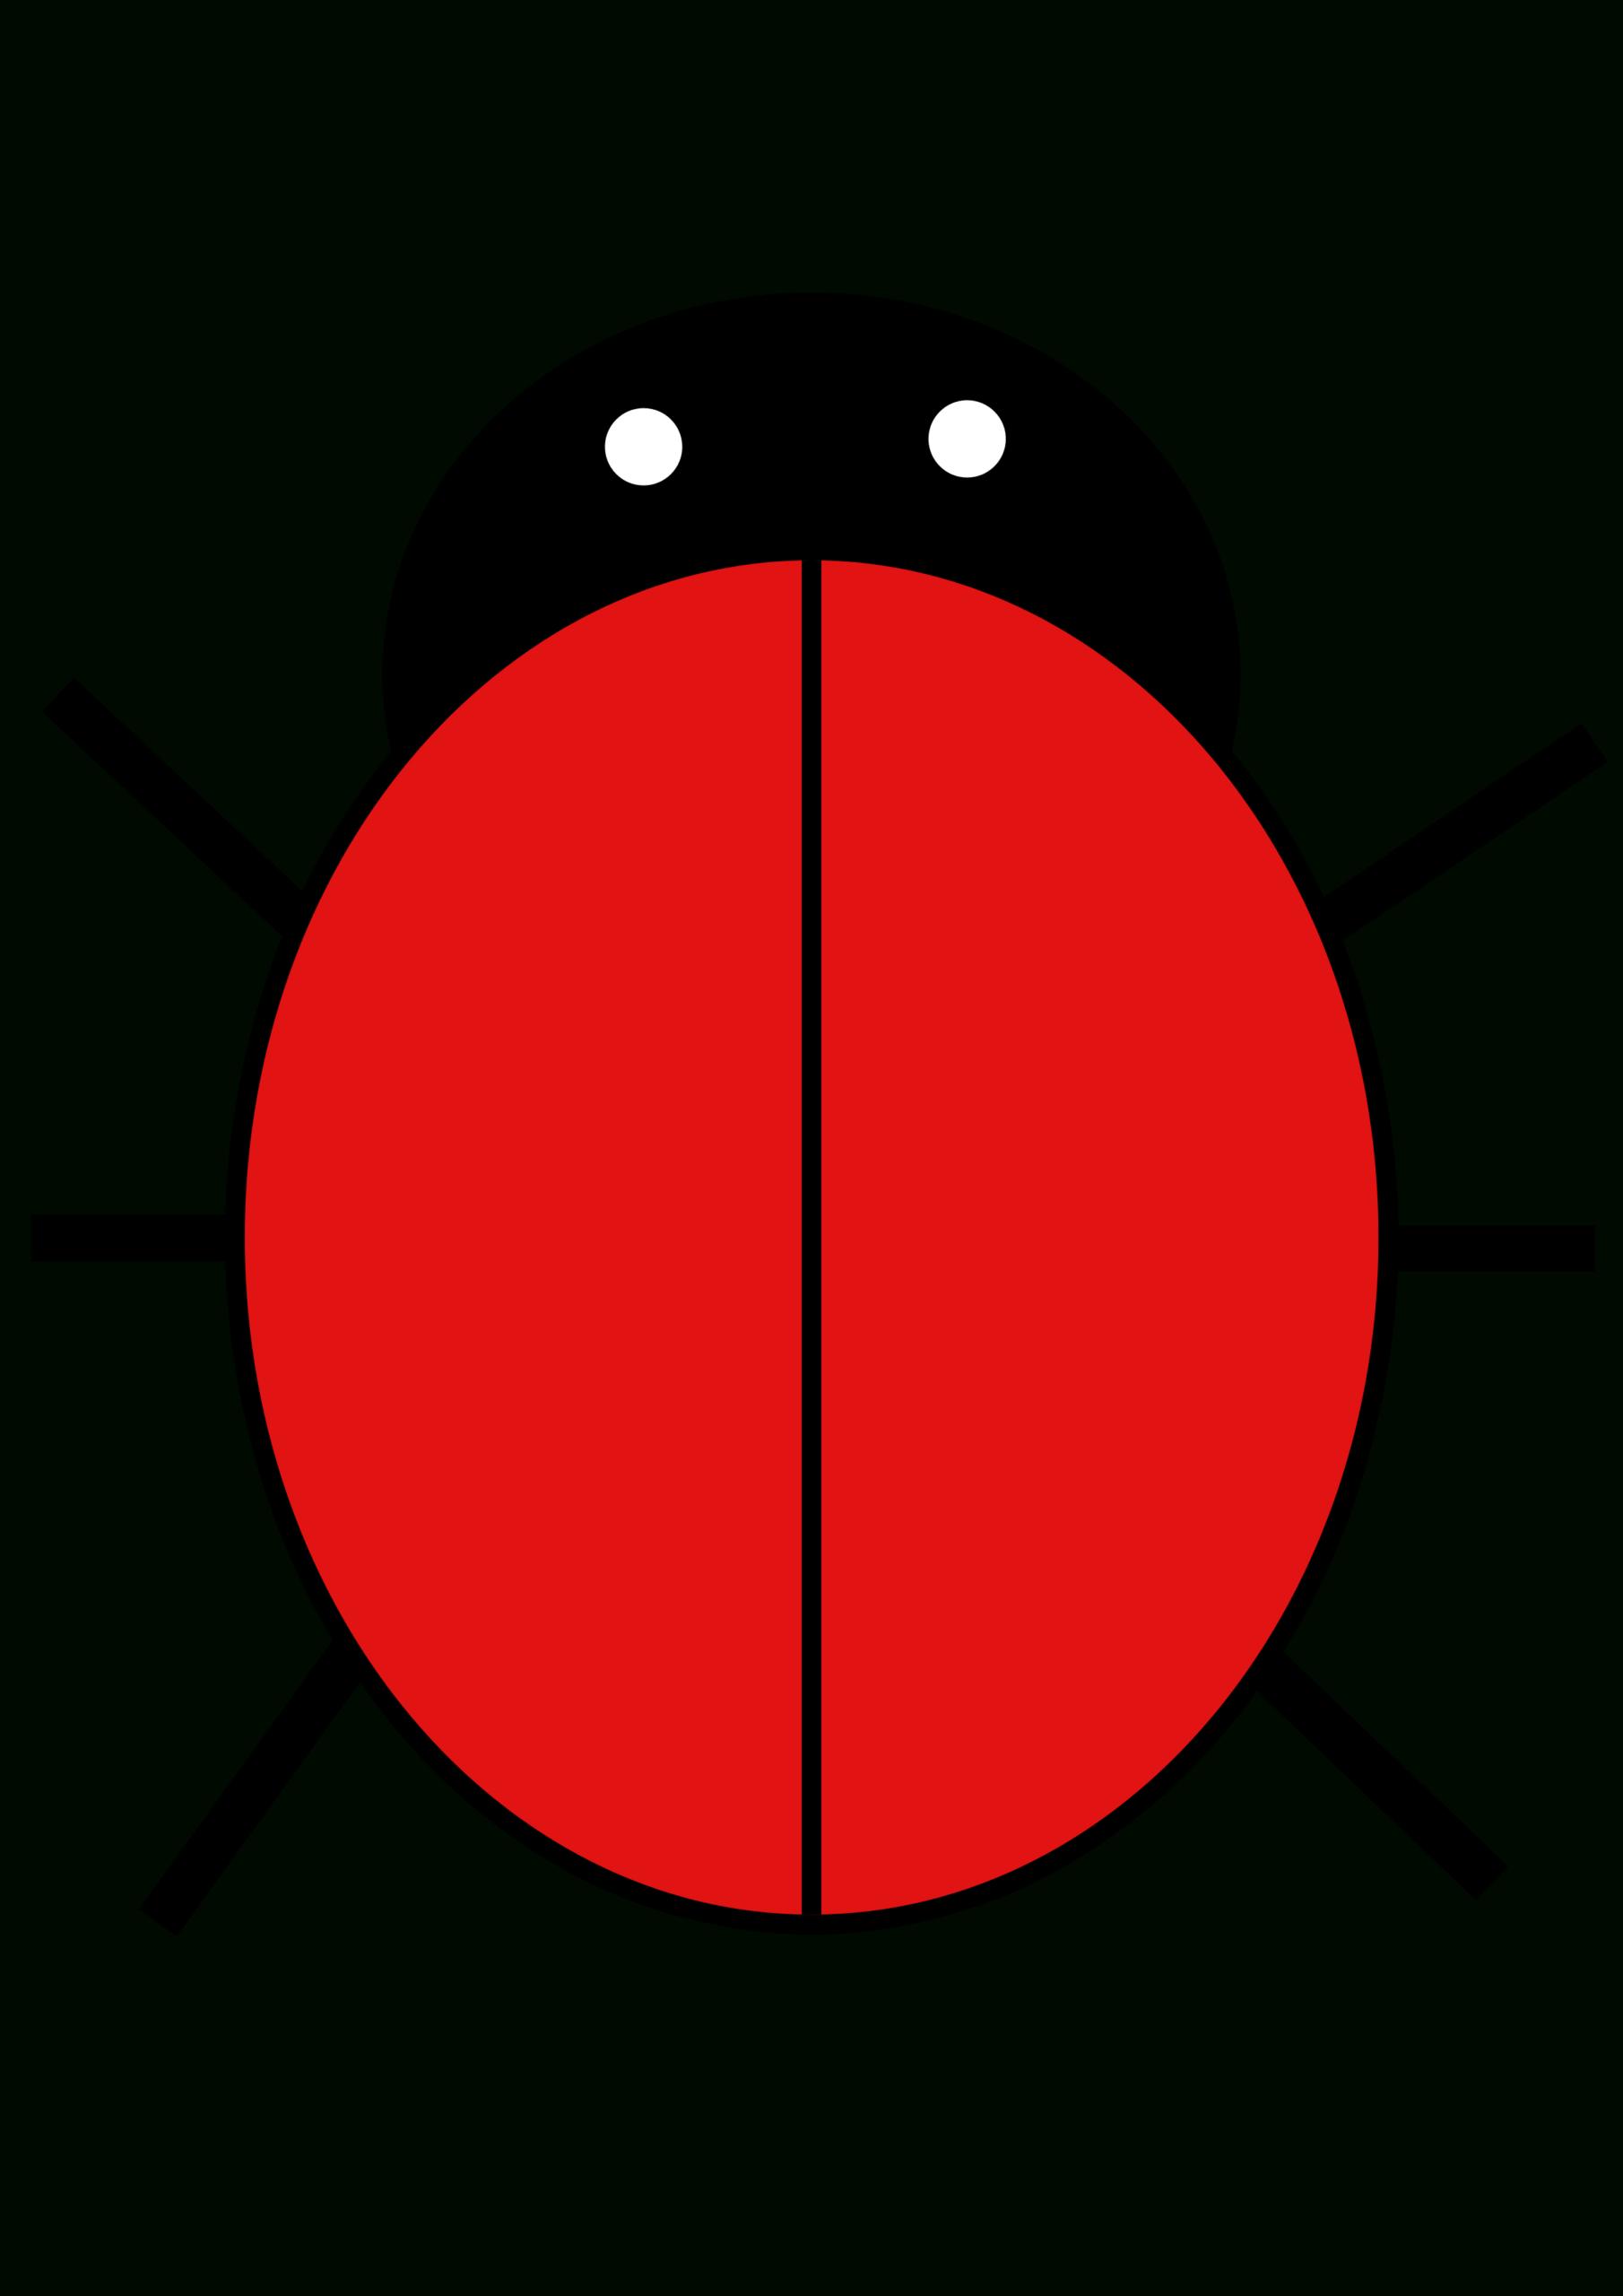 Best Photos Of Blank Ladybug Template Printable - Ladybug Within Blank Ladybug Template